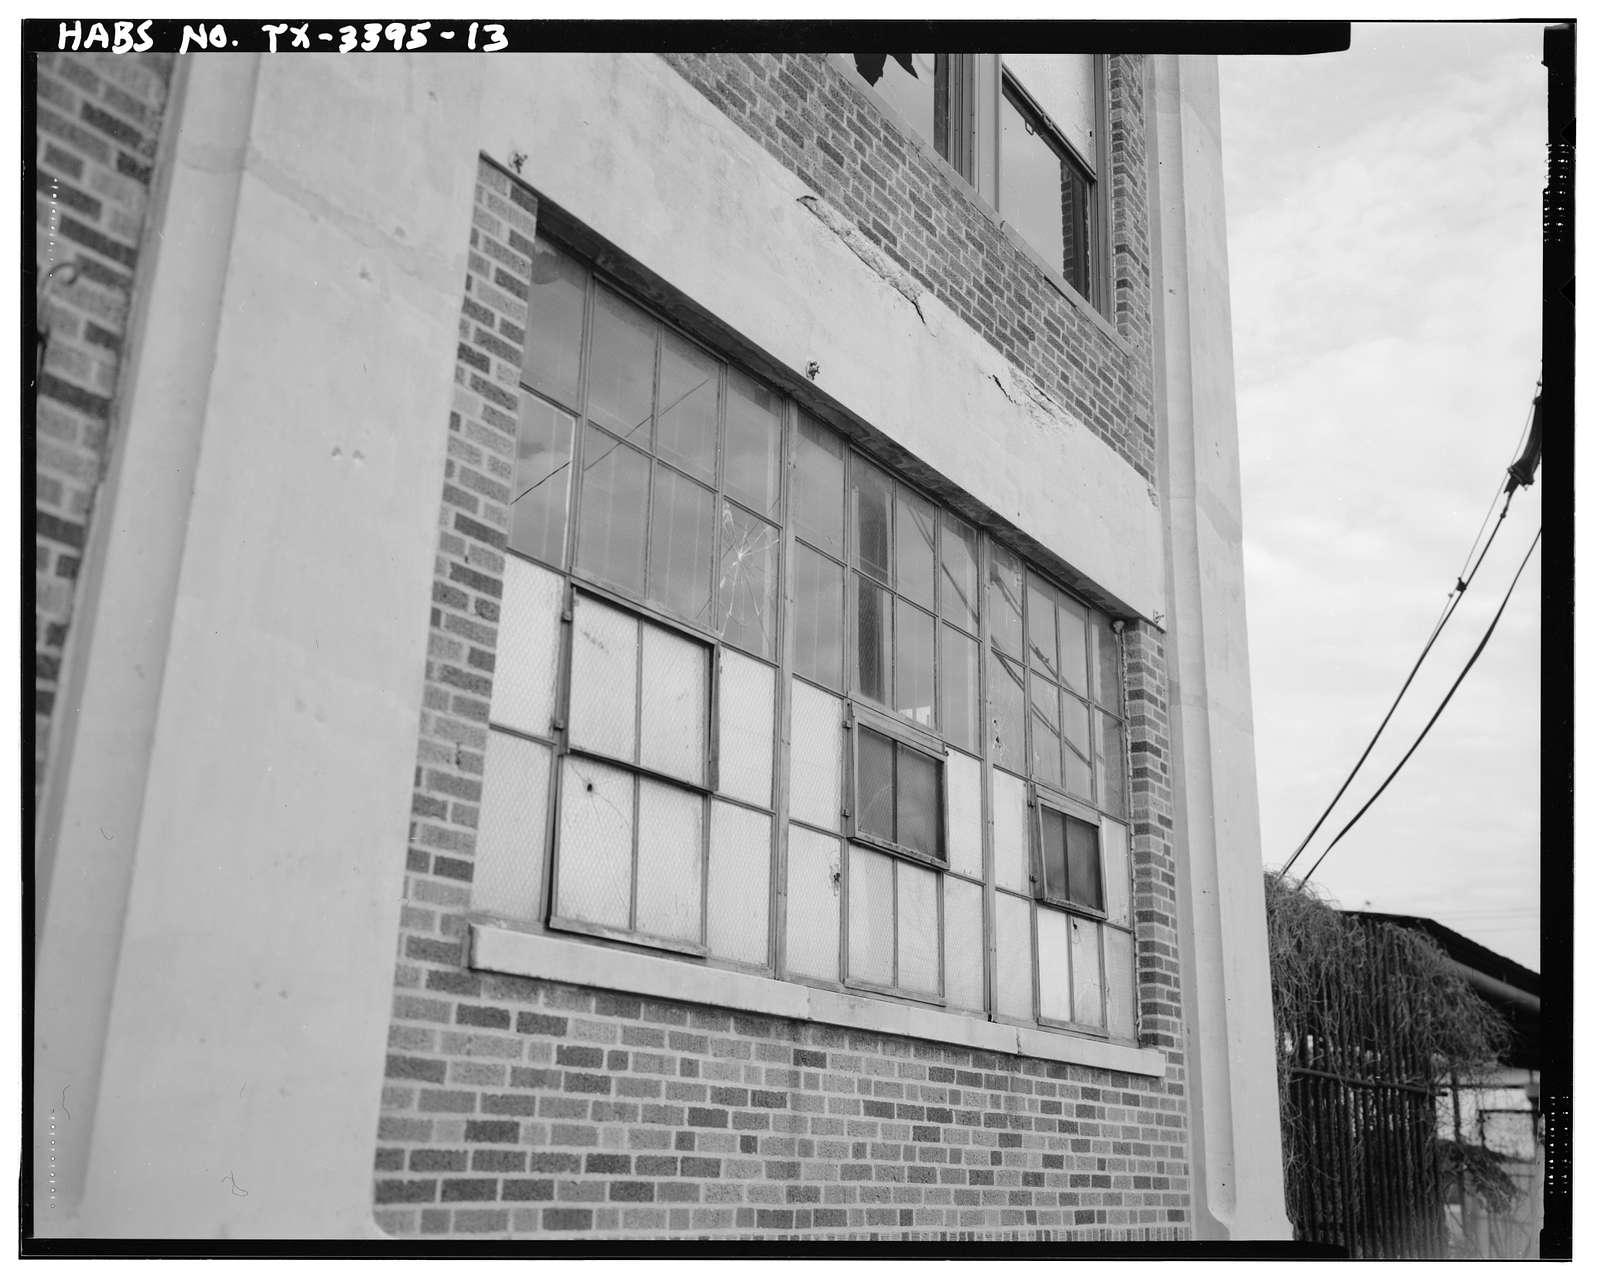 M-K-T Freight Terminal, 1811 Ruiz Street, Houston, Harris County, TX